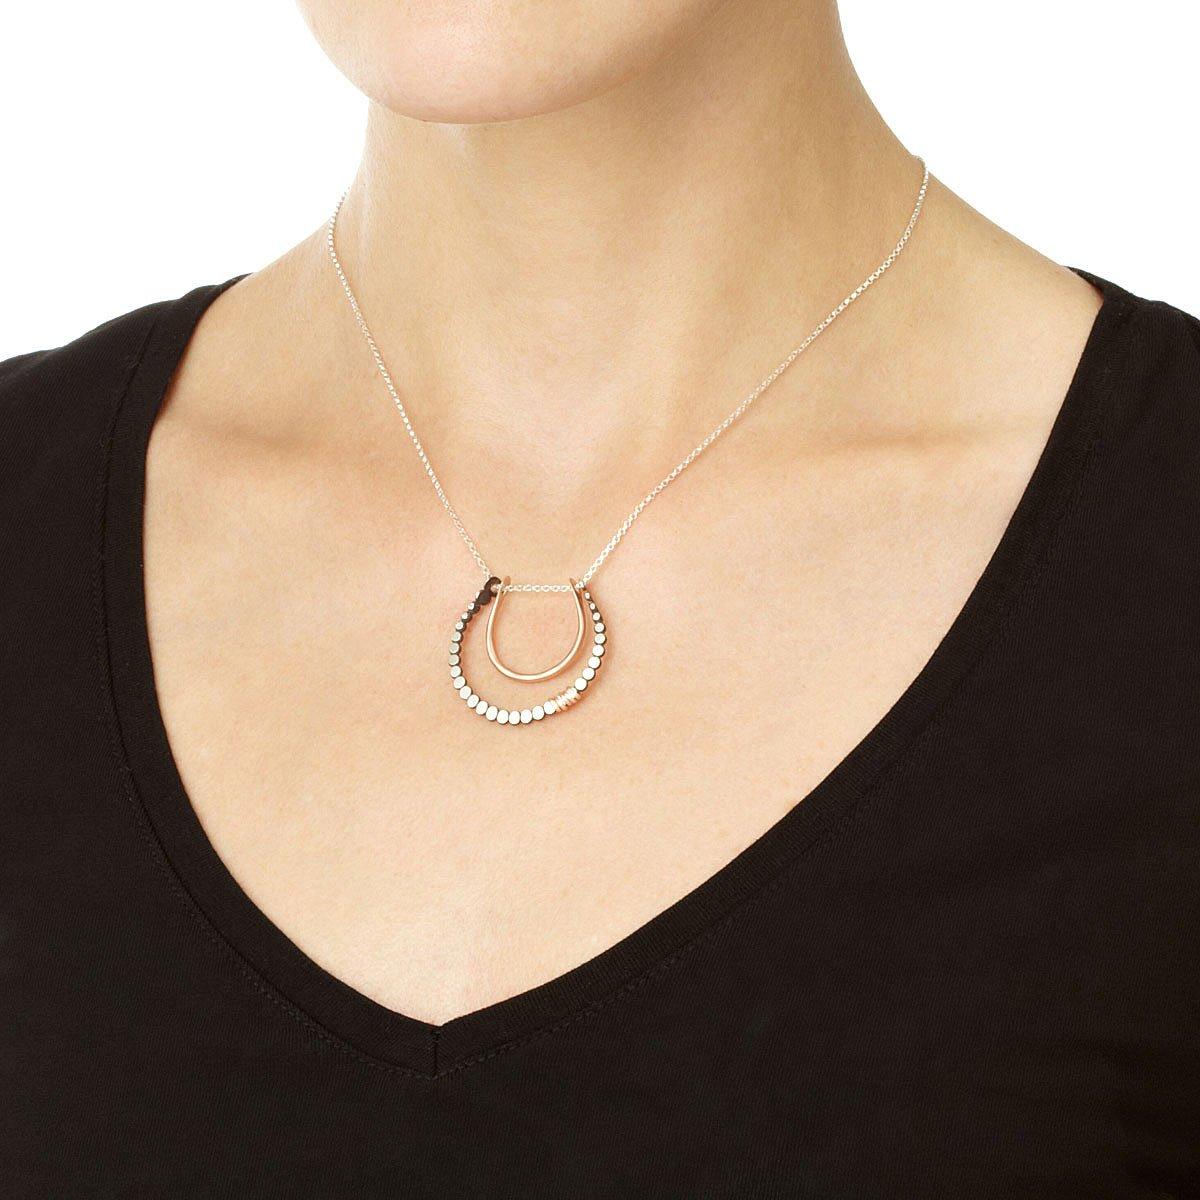 Horseshoe pendant good luck charm horseshoe uncommongoods horseshoe pendant 3 thumbnail aloadofball Gallery